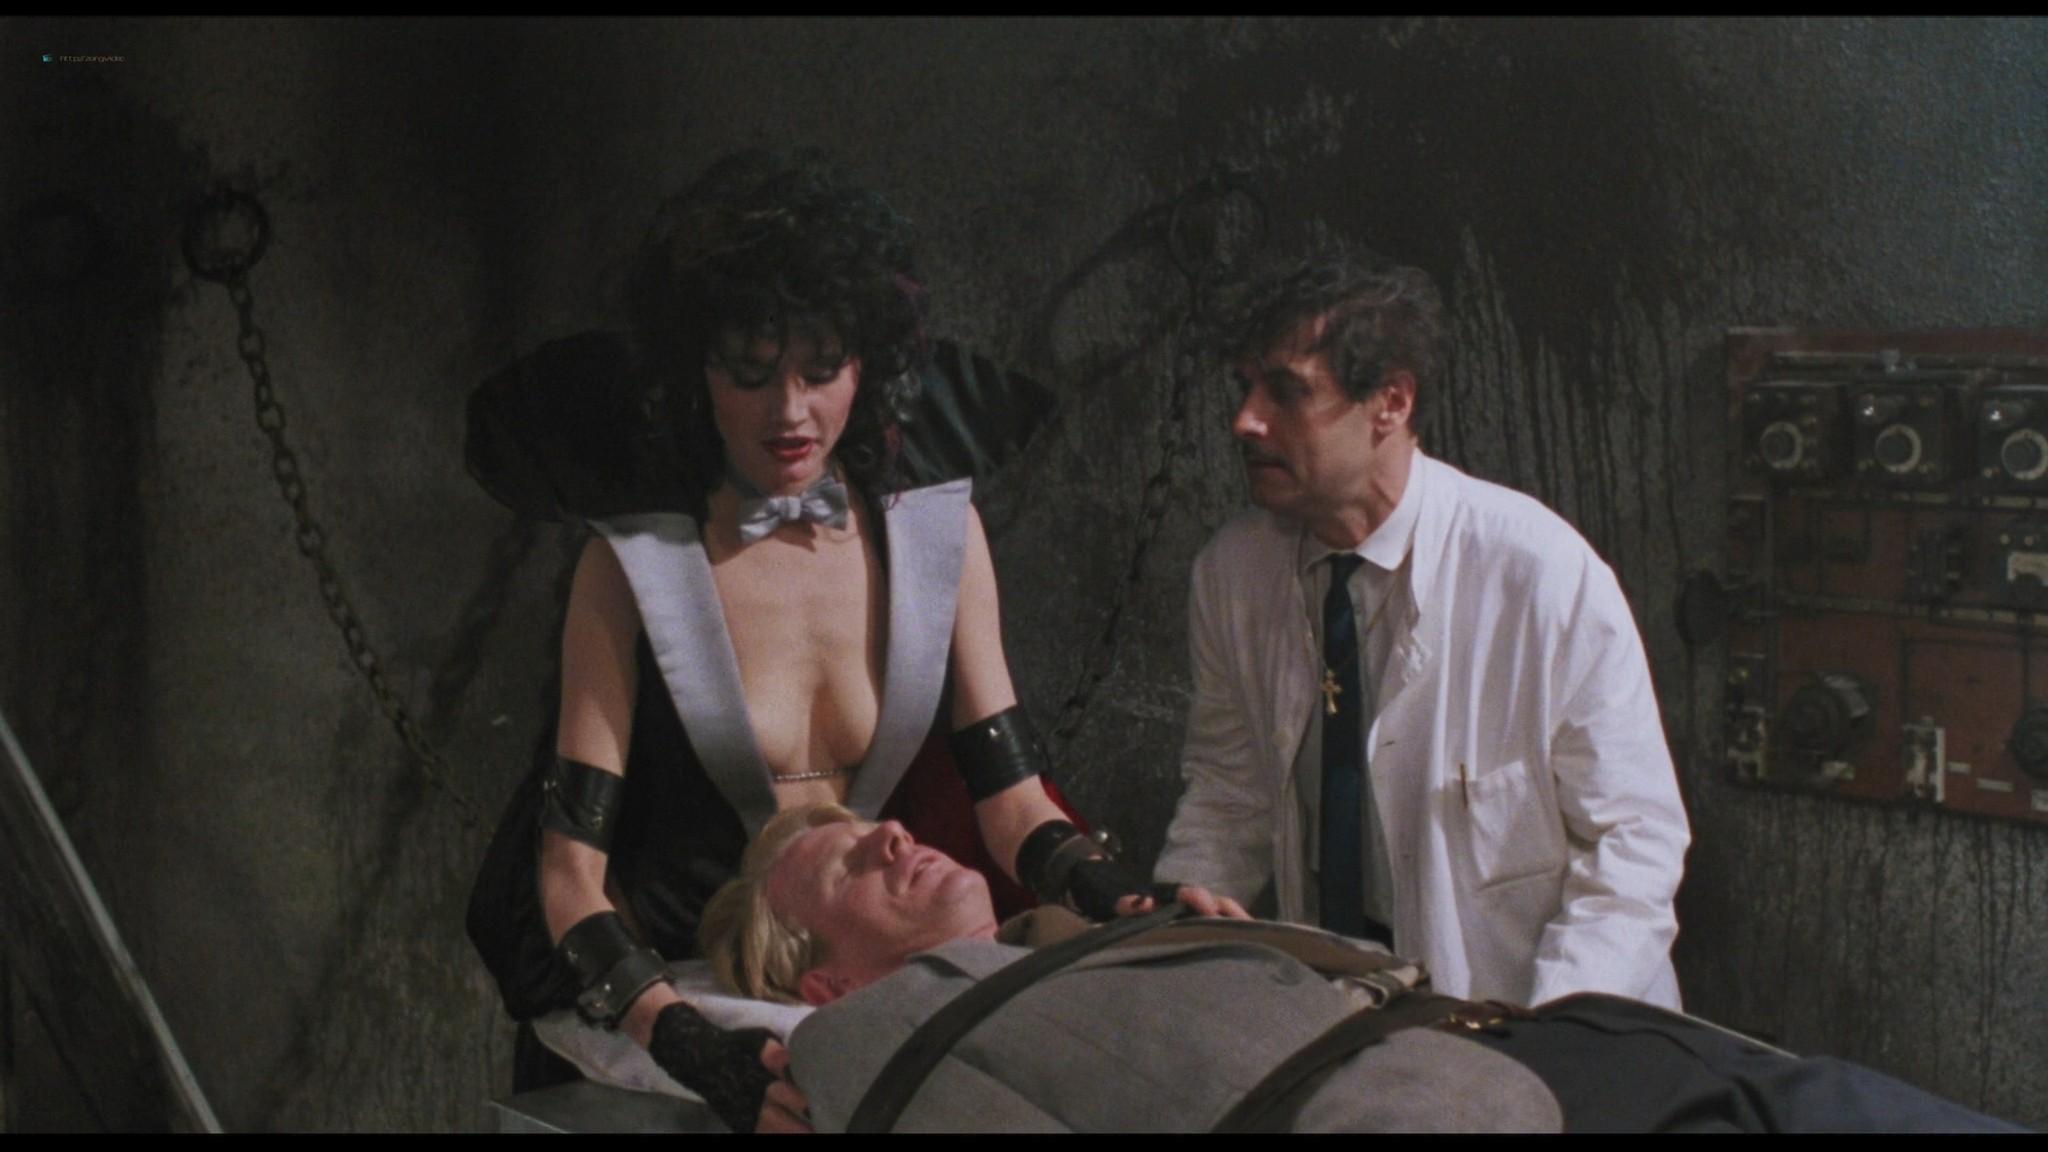 Geena Davis hot and sexy Ksenia Prohaska sexy - Transylvania 6-5000 (1985) HD 1080p BluRay (9)